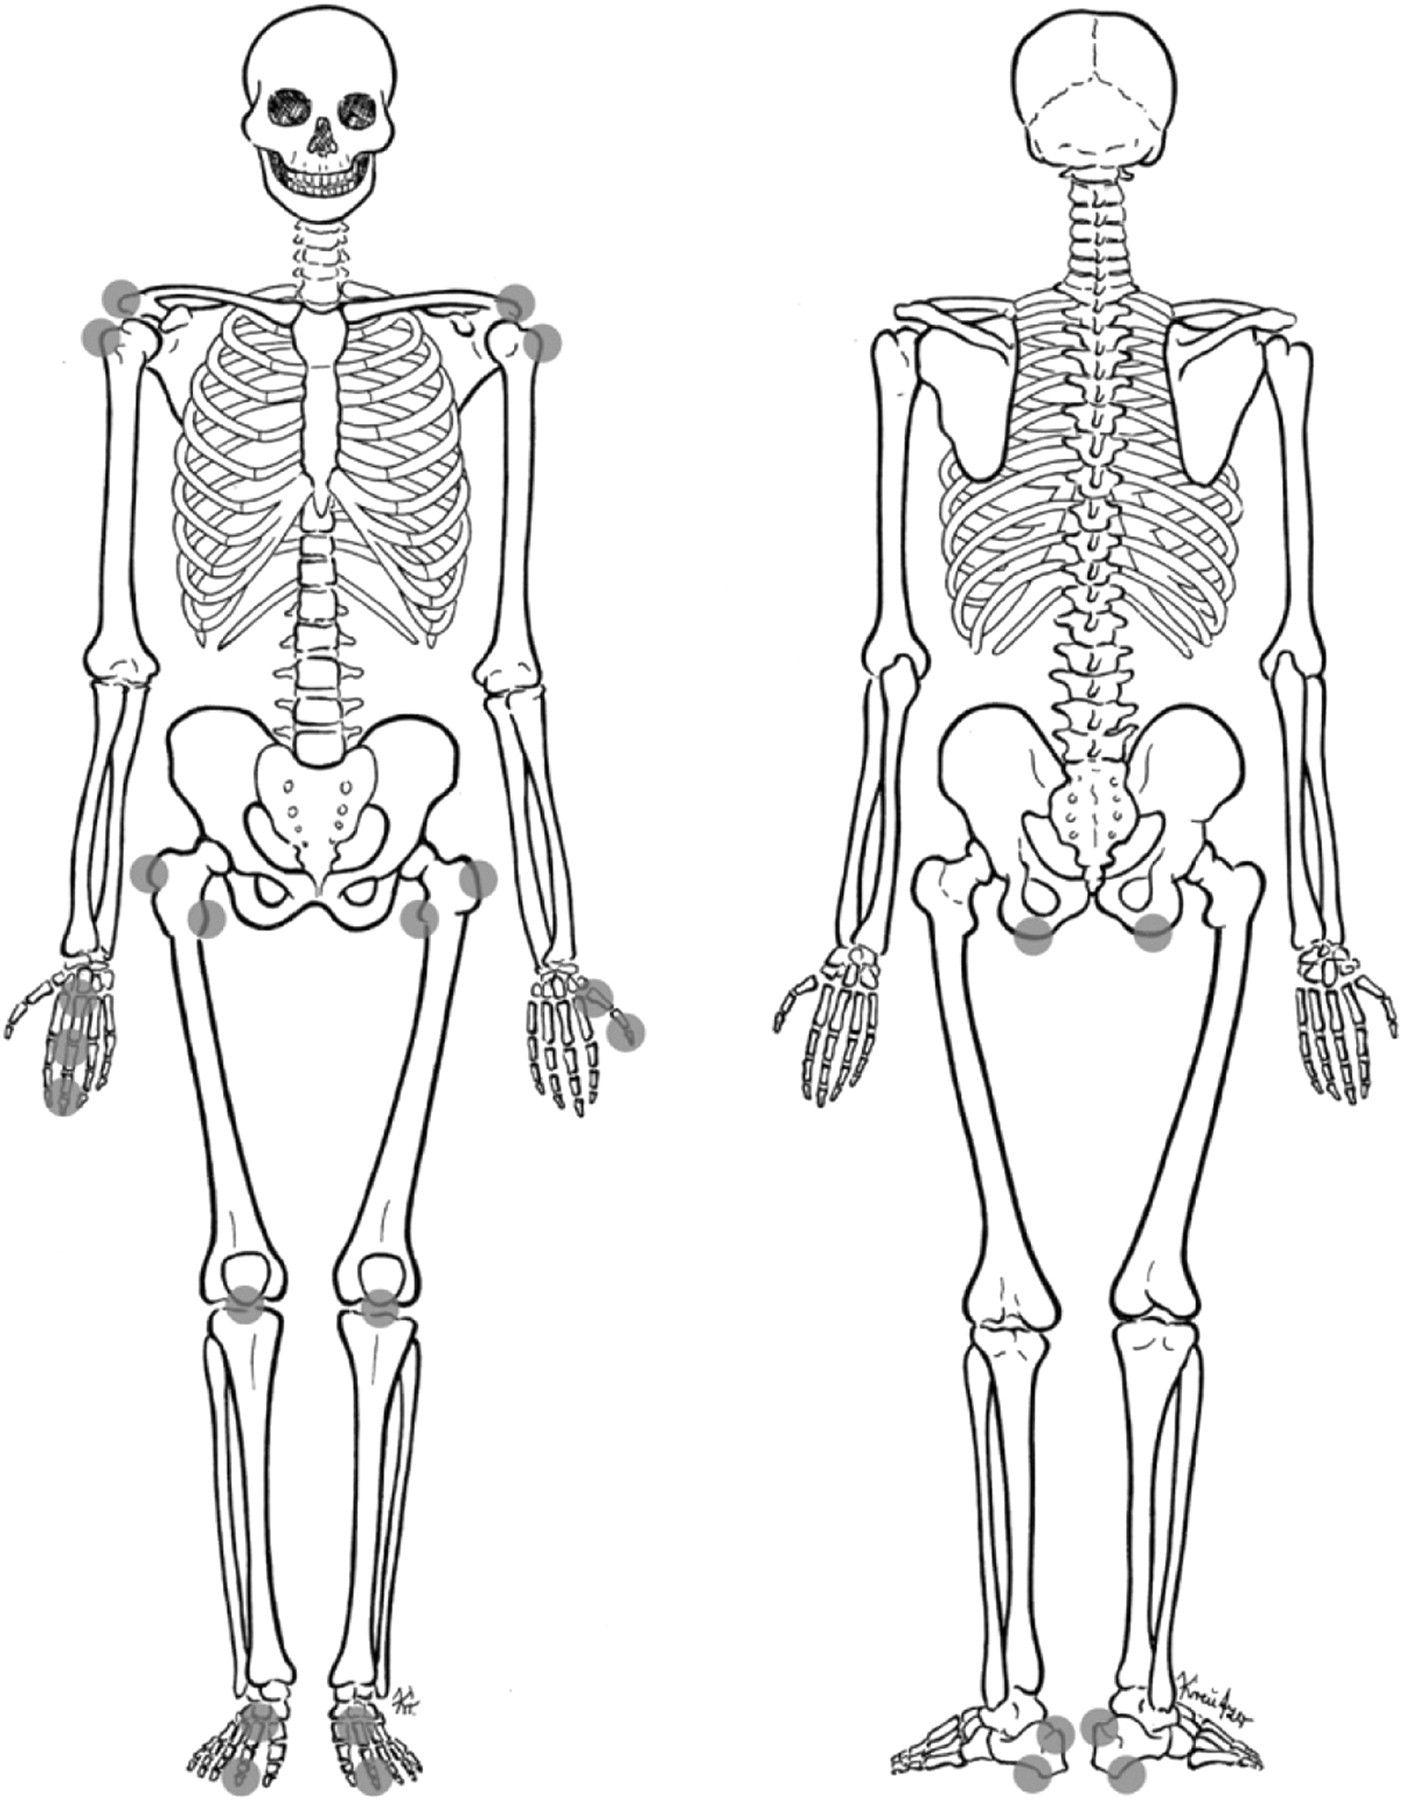 hight resolution of unlabeled human skeleton diagram unlabeled human skeleton diagram labeled diagram of skeletal system printable human